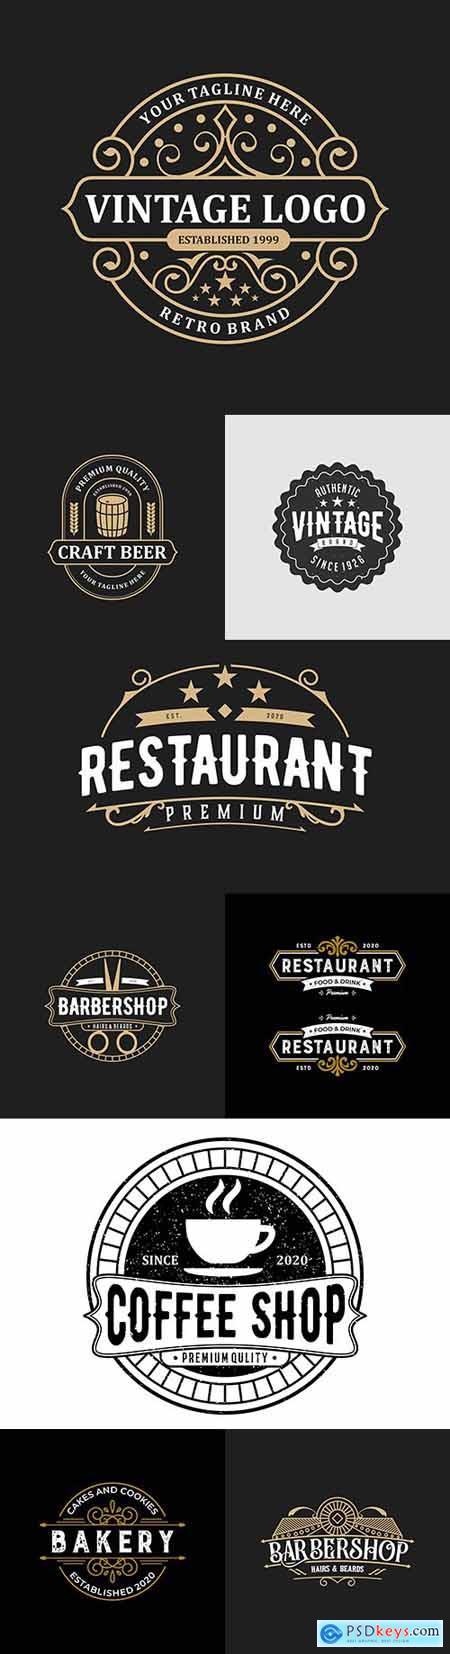 Vintage logo for restaurant and salon brand name design